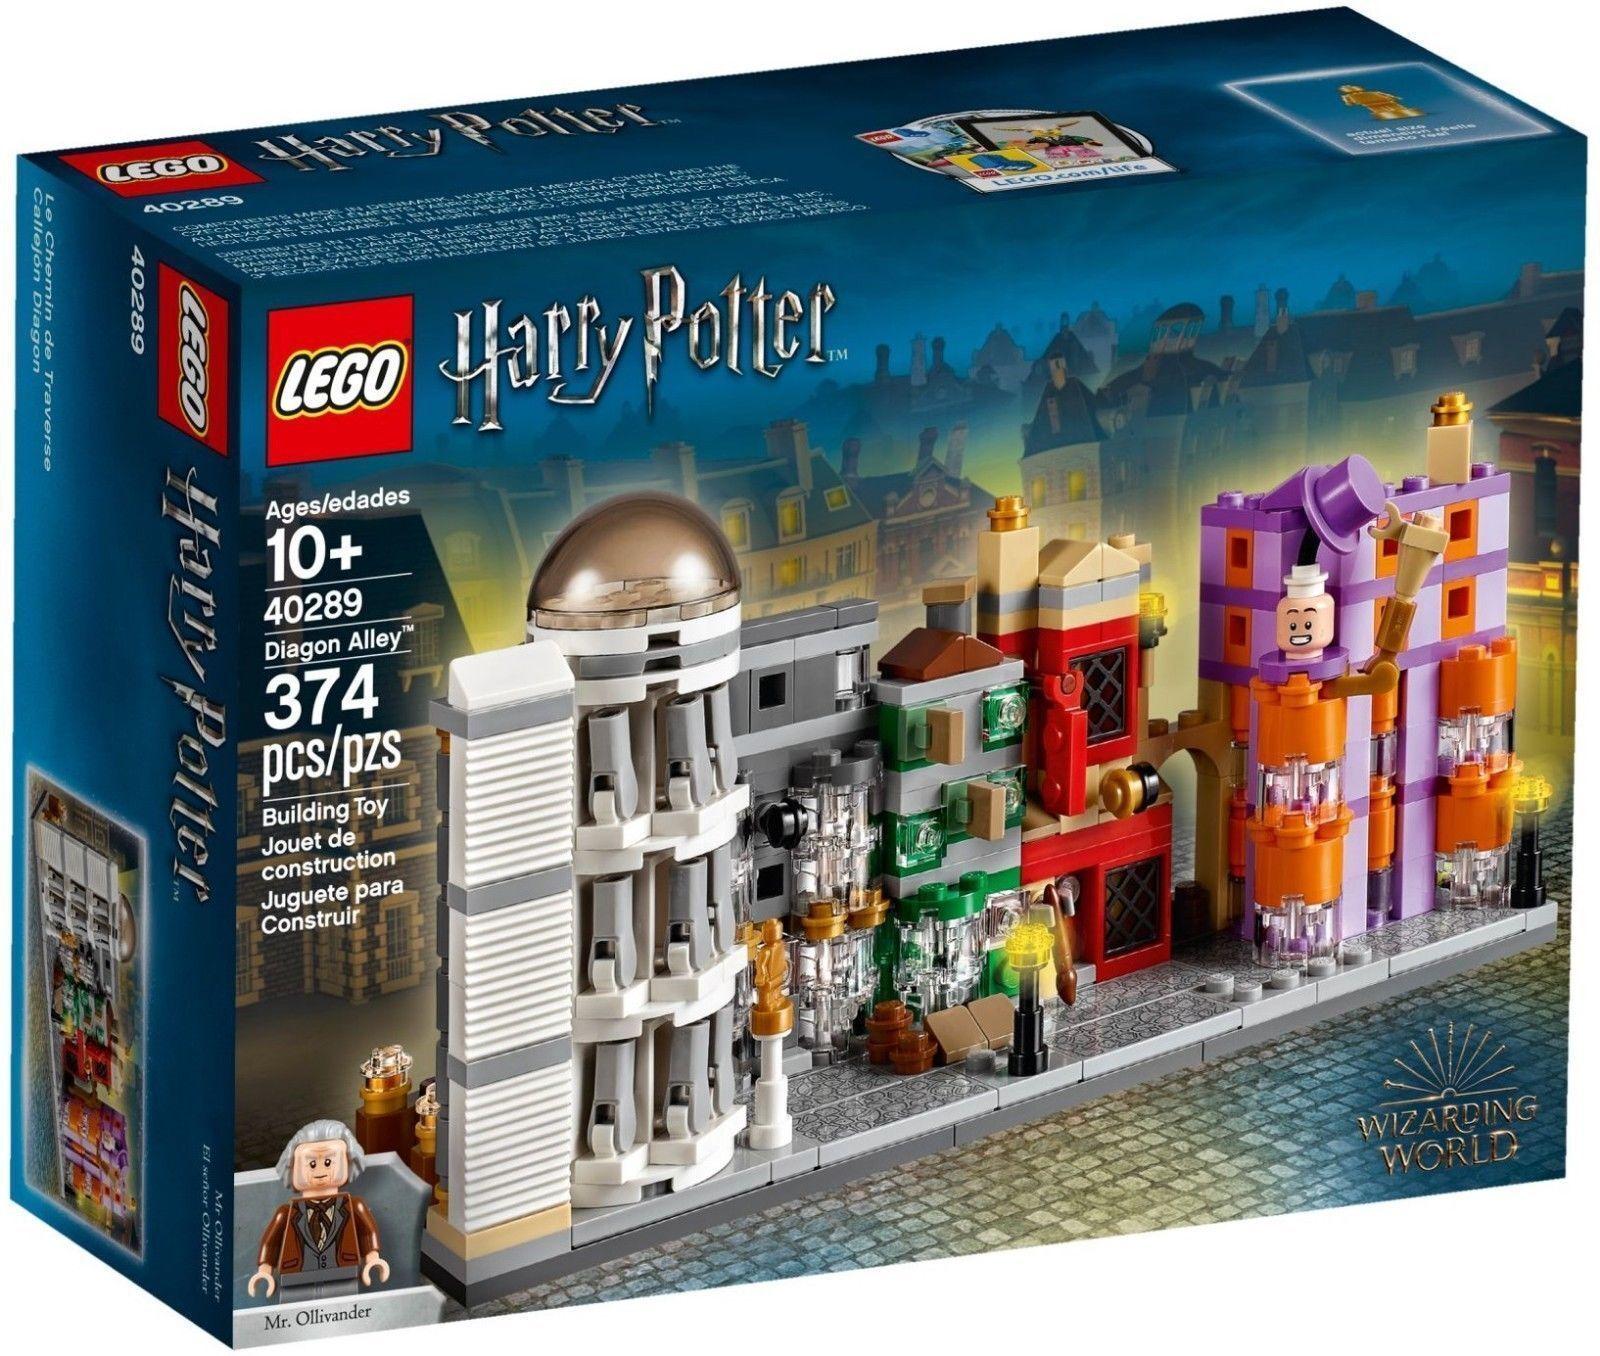 LEGO 40289 Harry Potter Diagon Alley Micro Build 374pcs  *NEW*